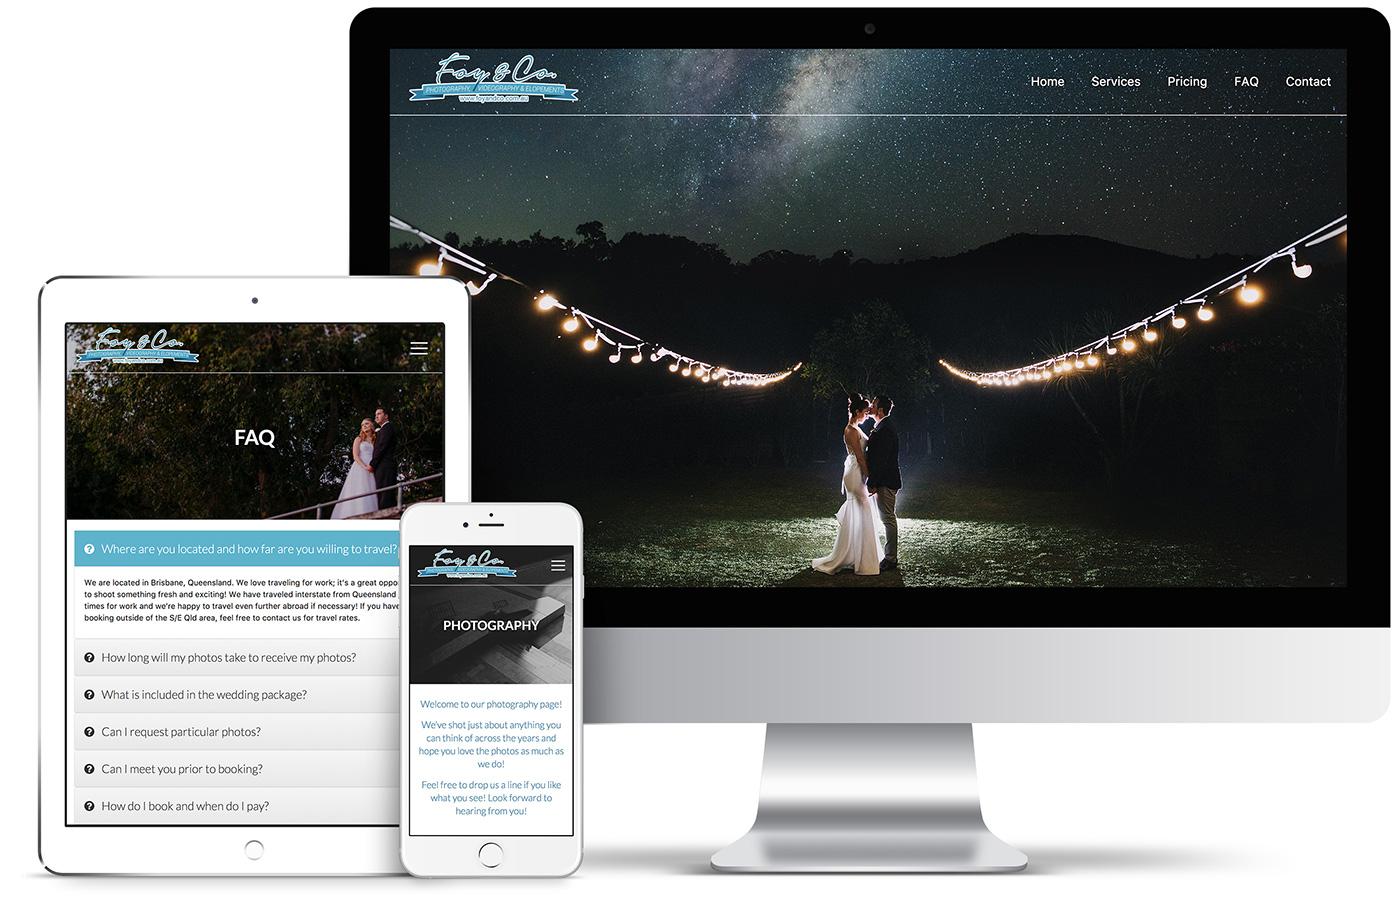 foy-and-co-wedding-website-design-australia-robert-mullineux